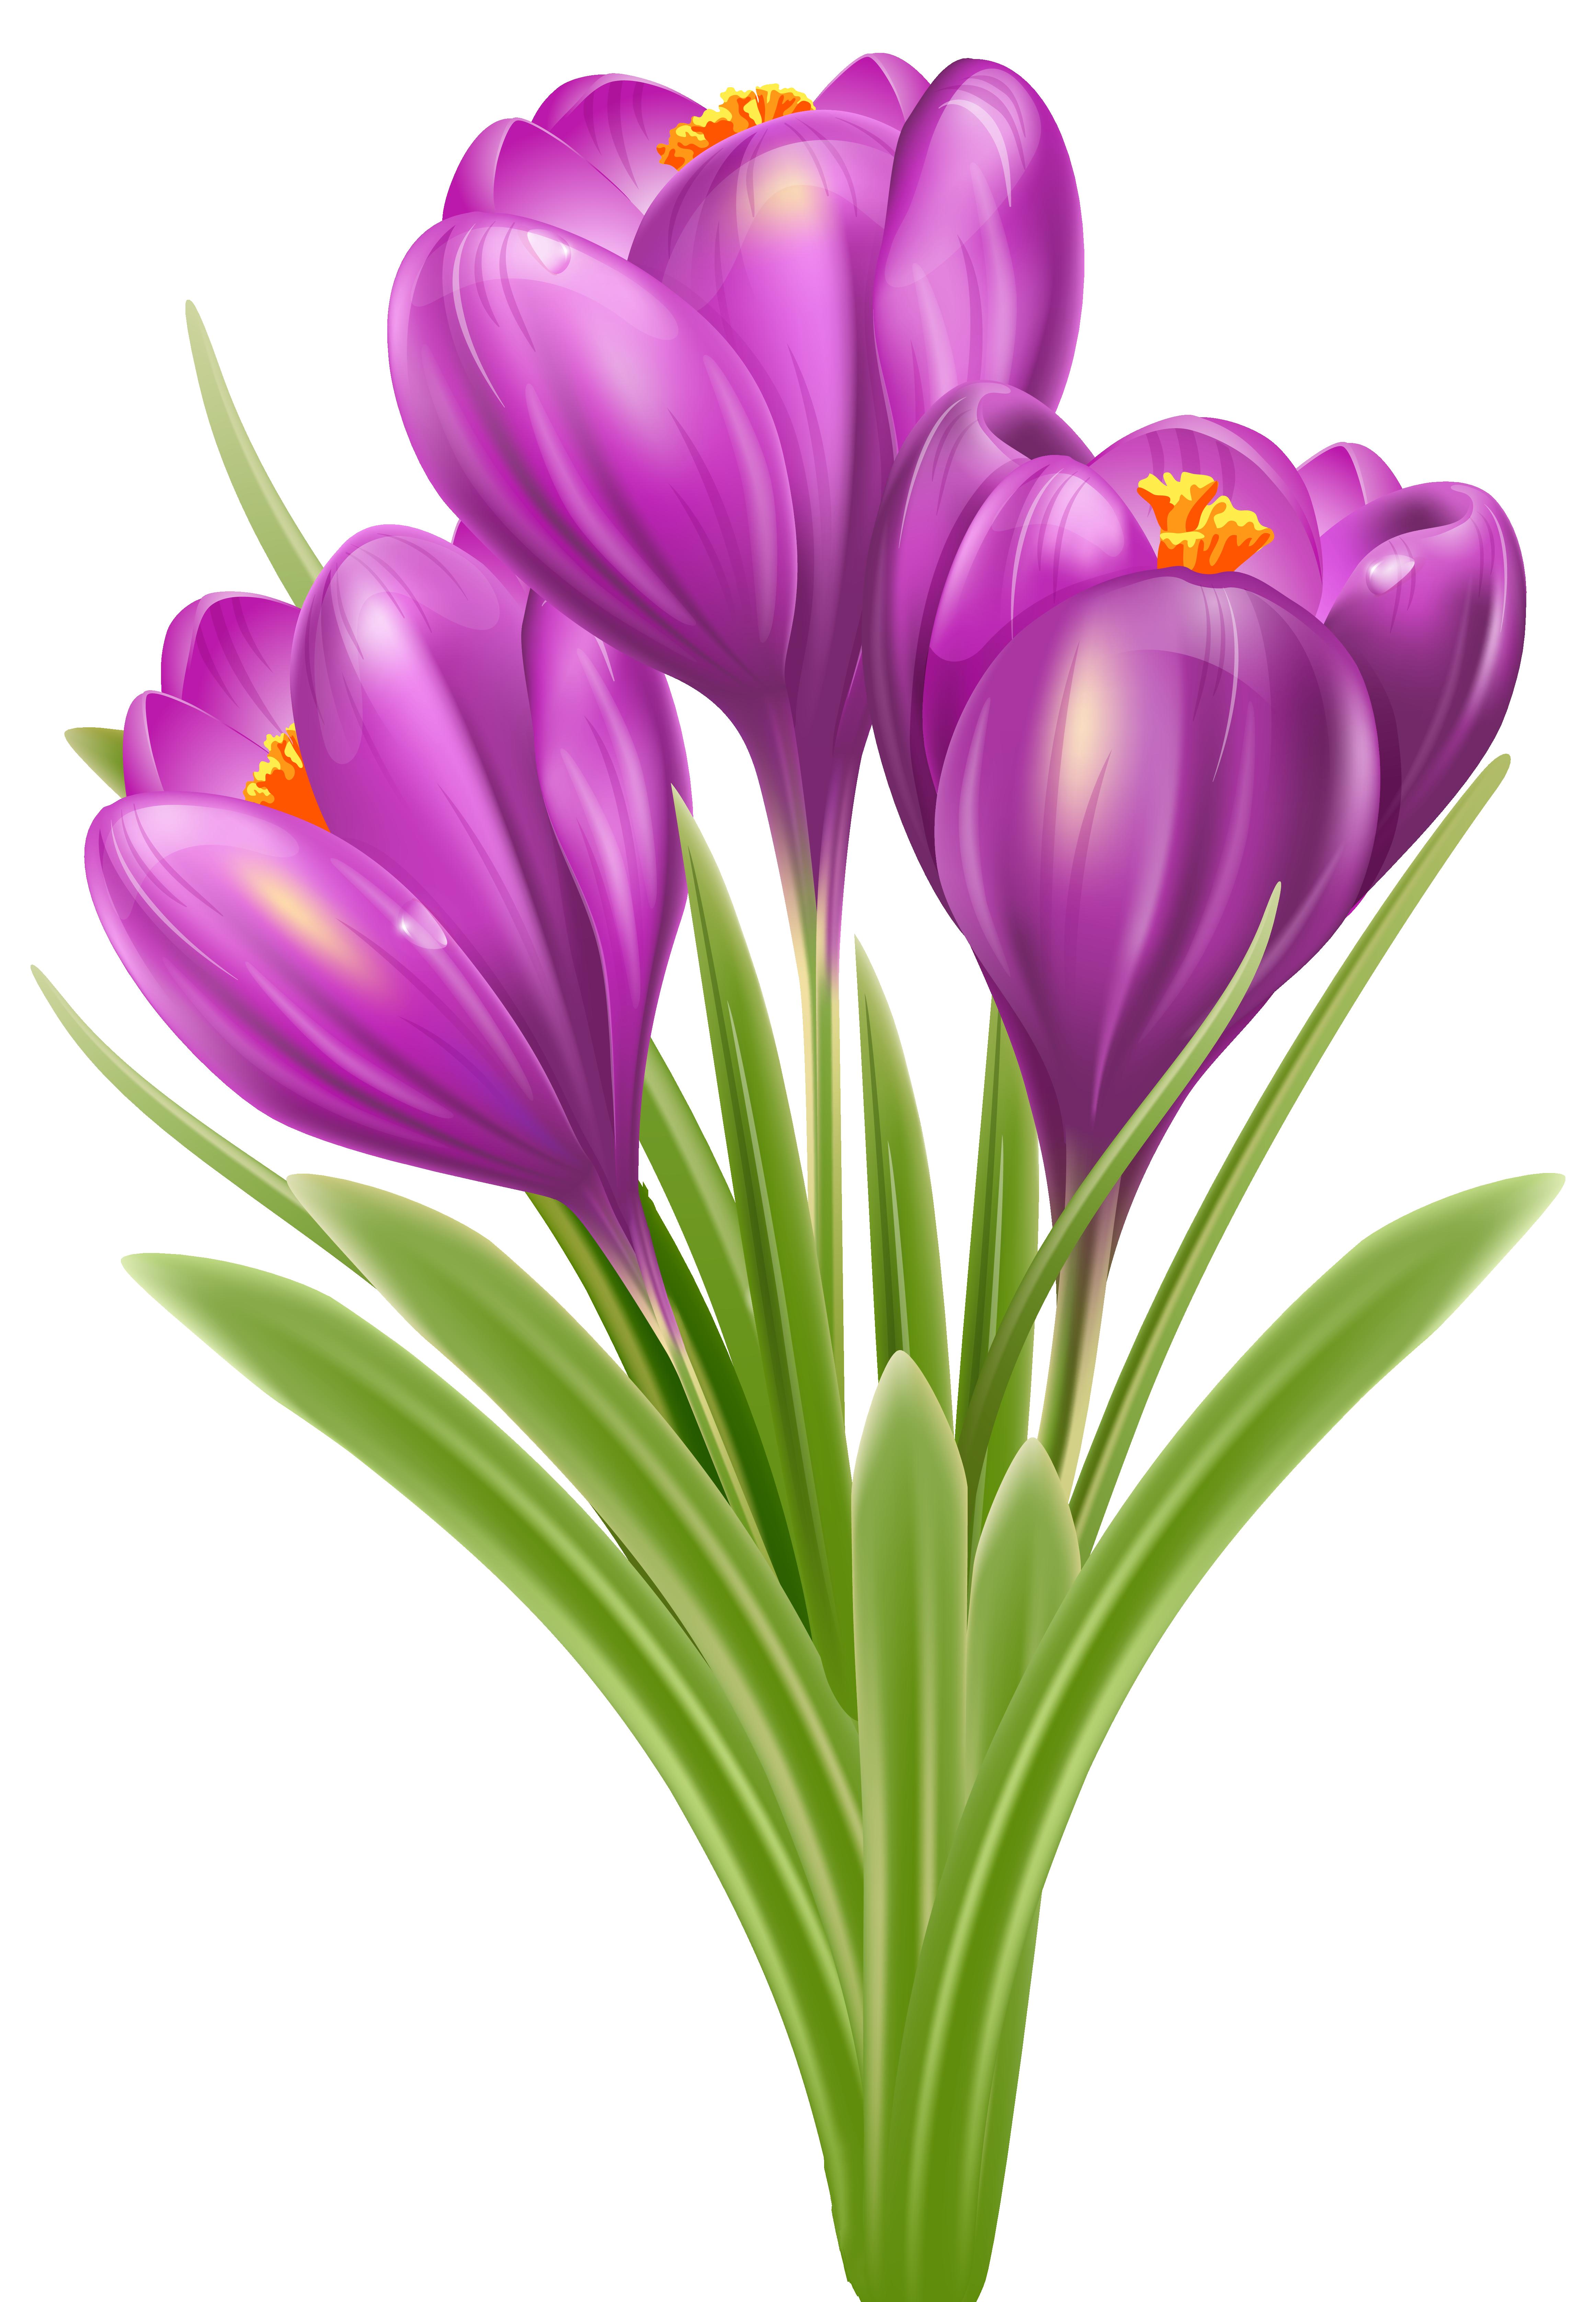 Spring Crocus PNG Image.